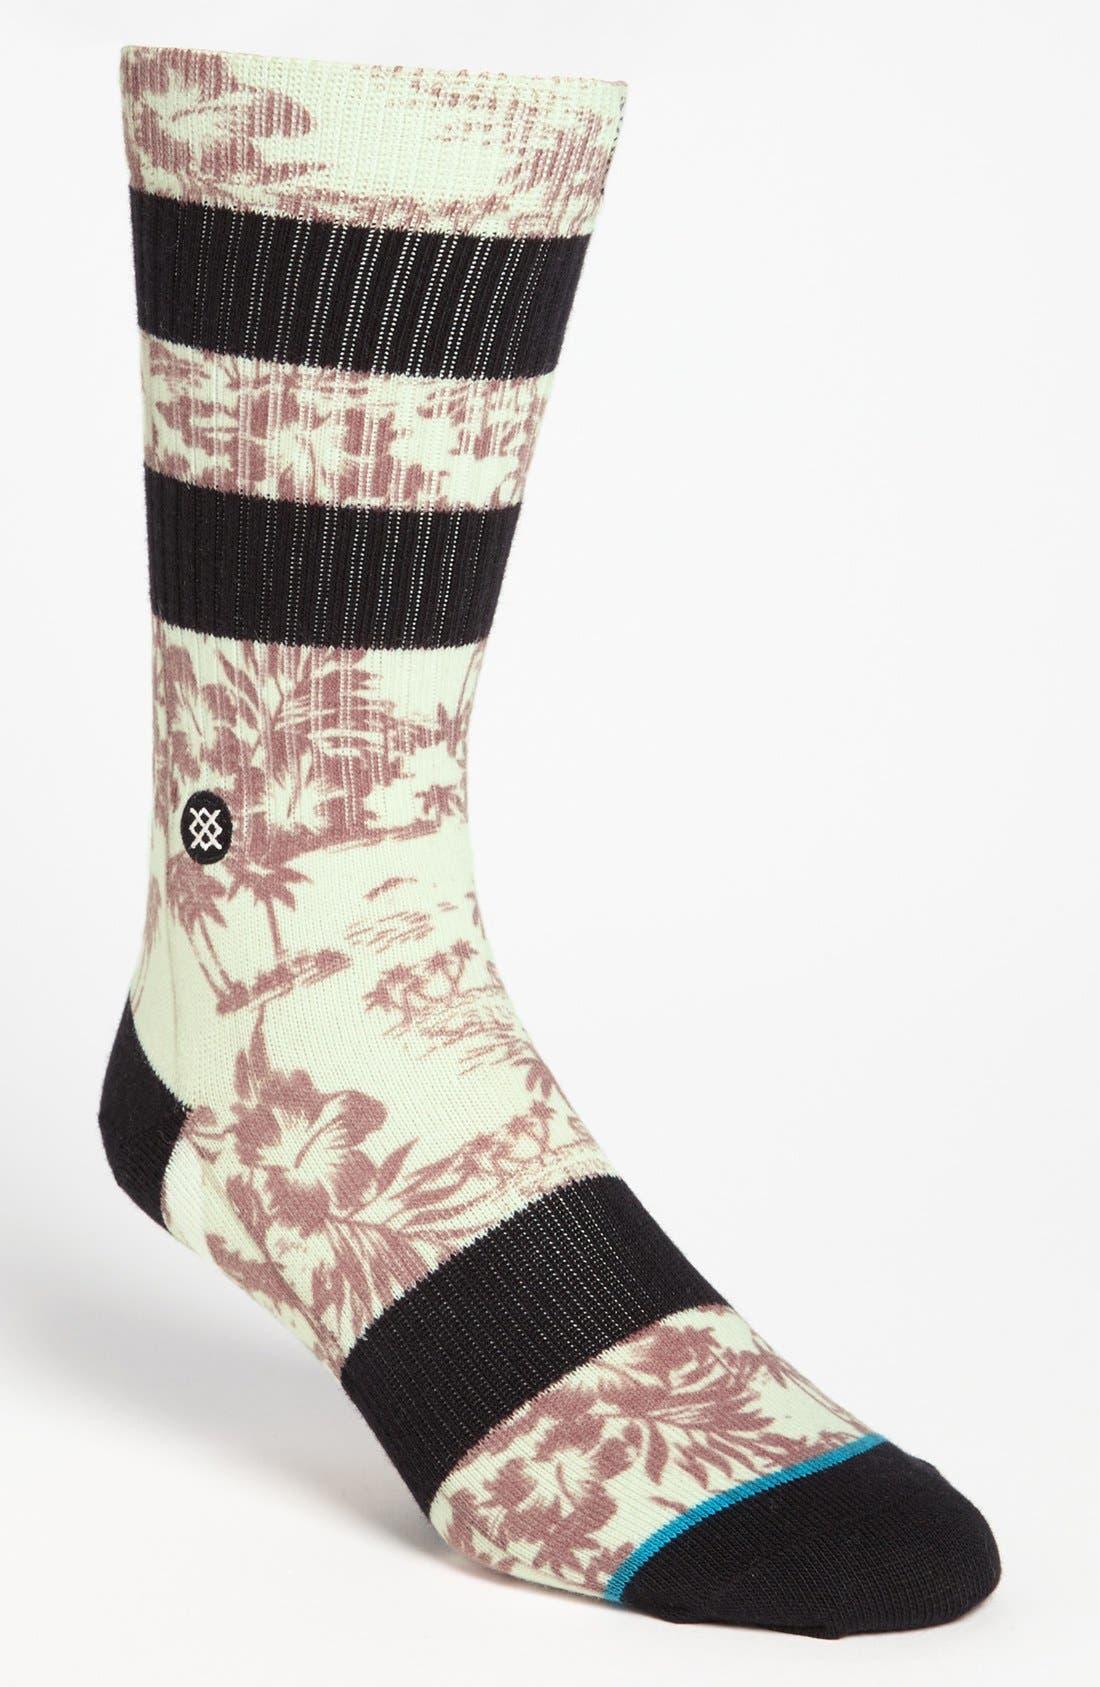 Alternate Image 1 Selected - Stance 'Waipio' Dress Socks